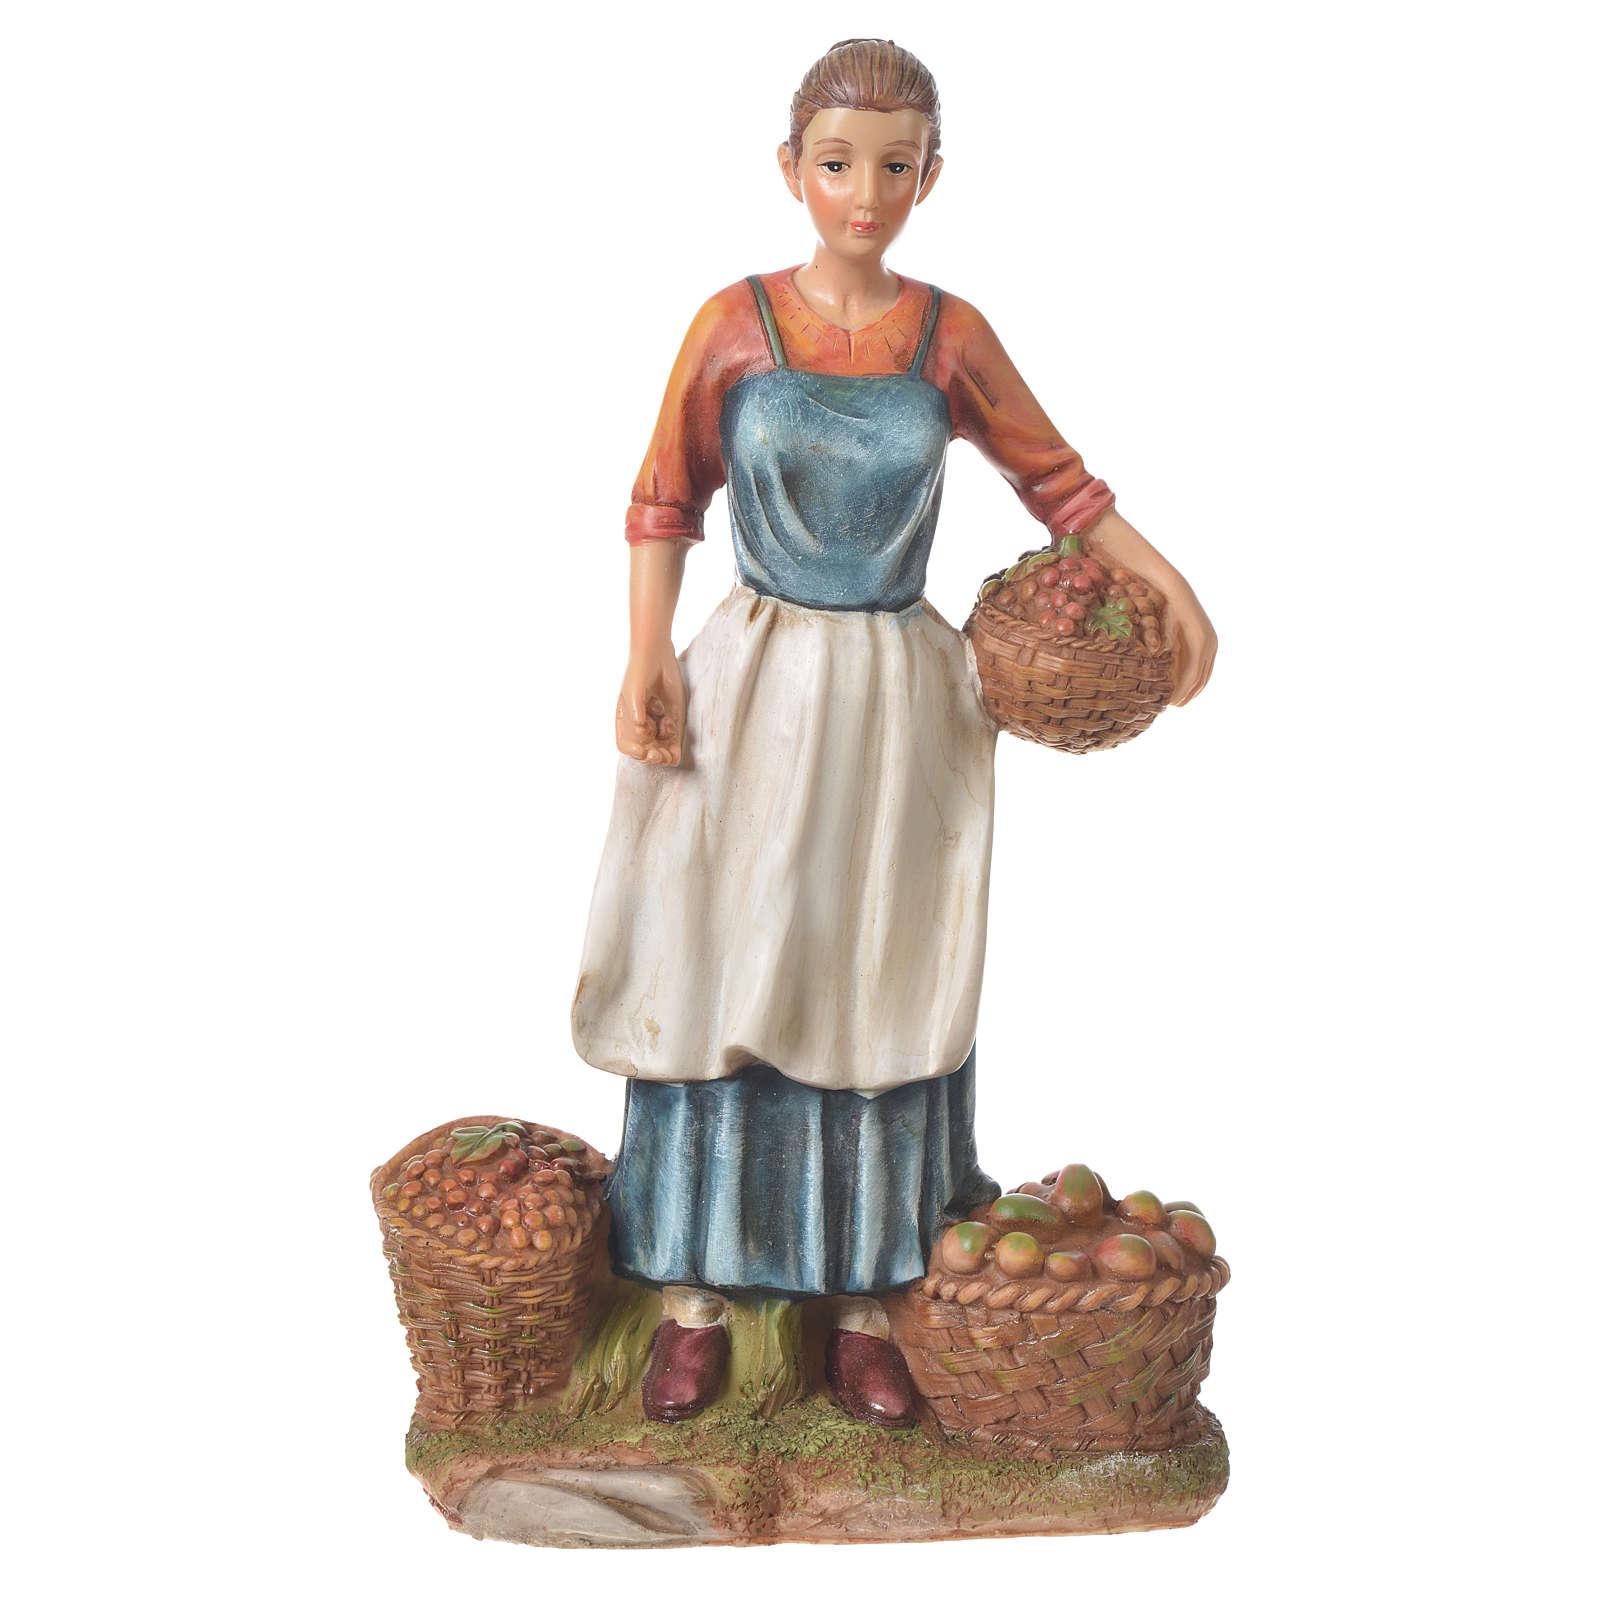 Vendedora de fruta y verdura para belenes de 30cm, resina 3